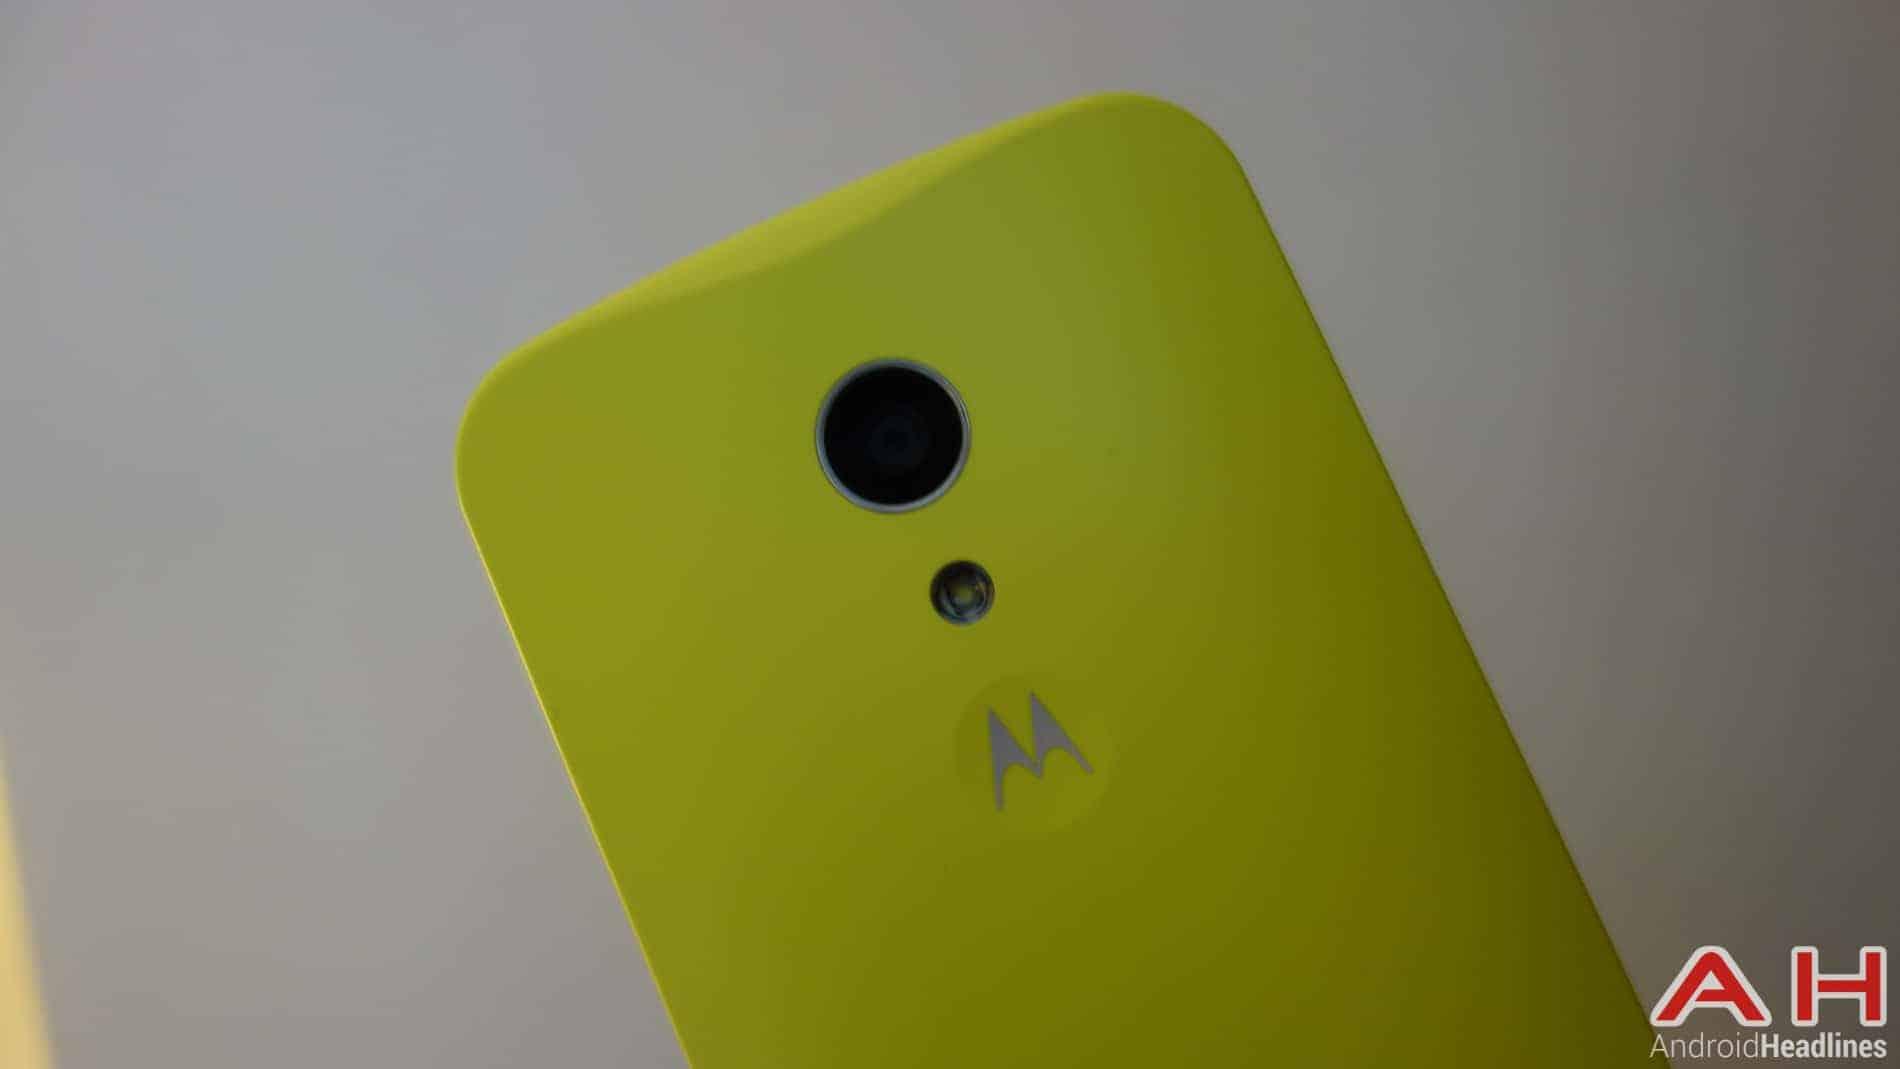 Motorola AH 273